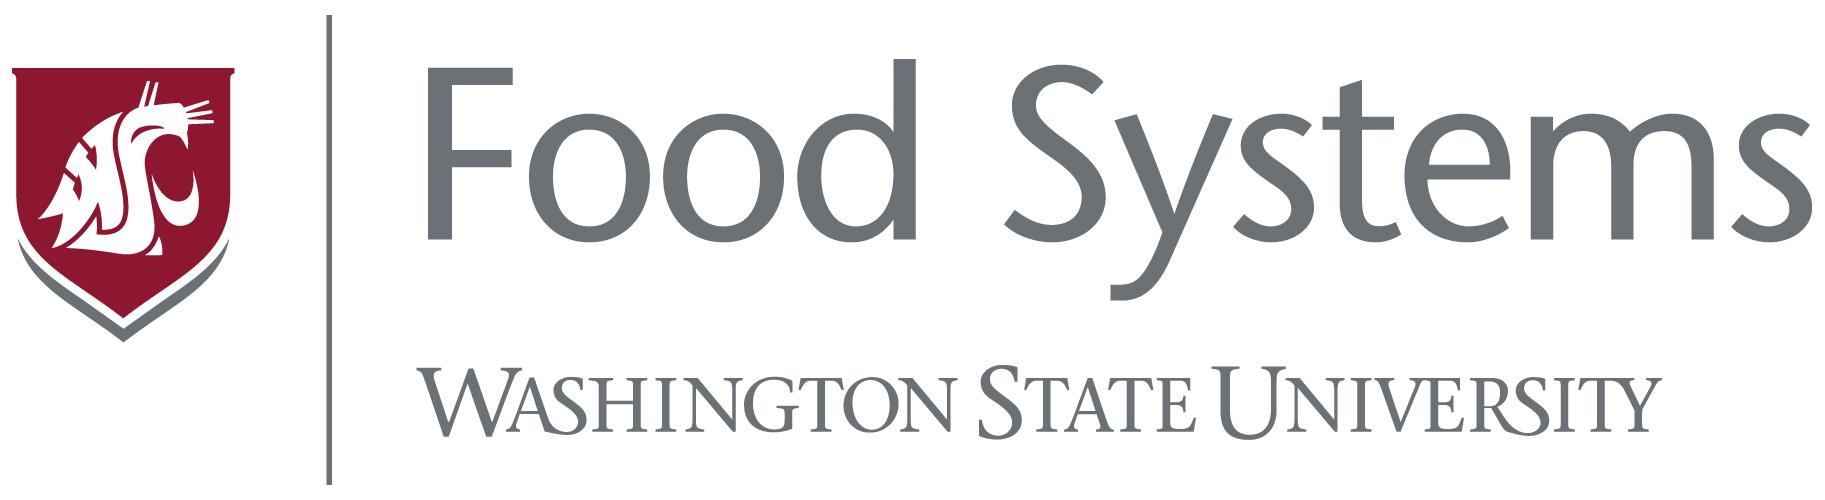 Food Systems.jpg